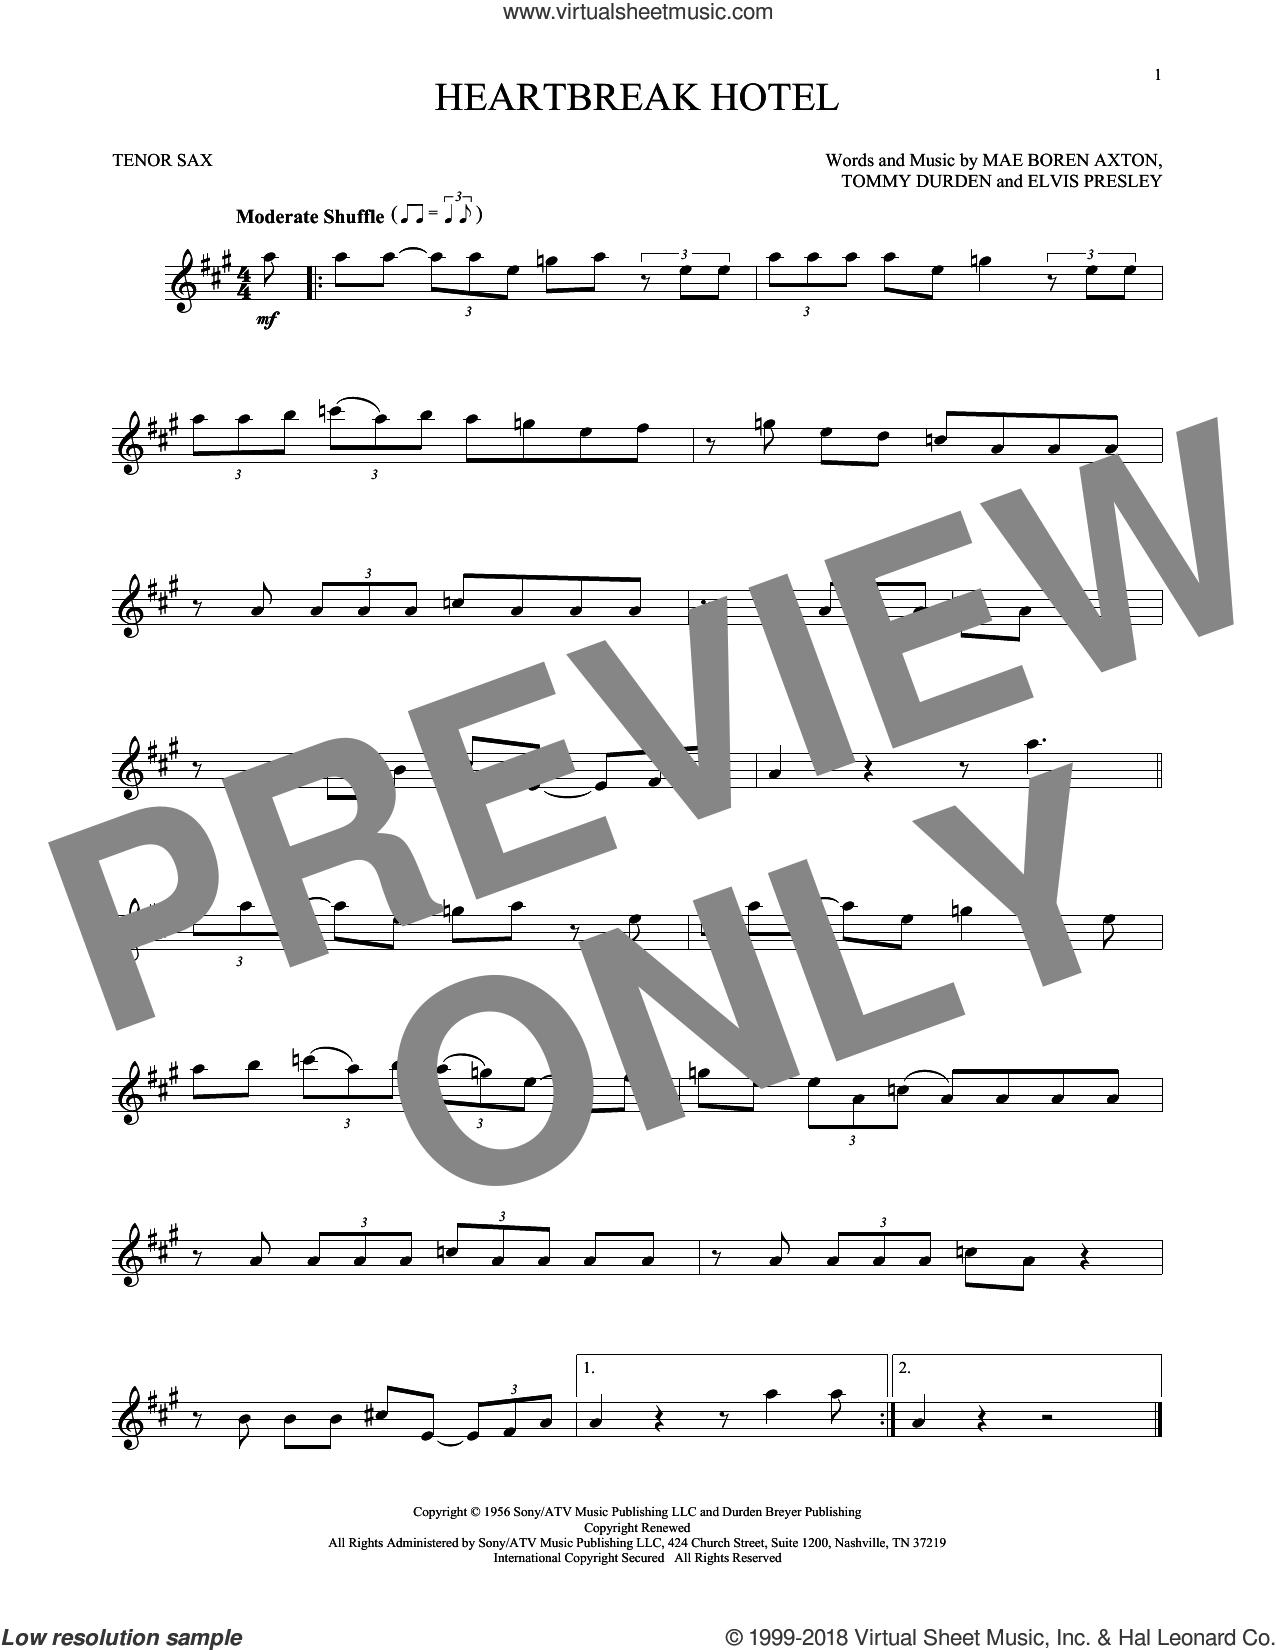 Heartbreak Hotel sheet music for tenor saxophone solo by Elvis Presley, Mae Boren Axton and Tommy Durden, intermediate skill level